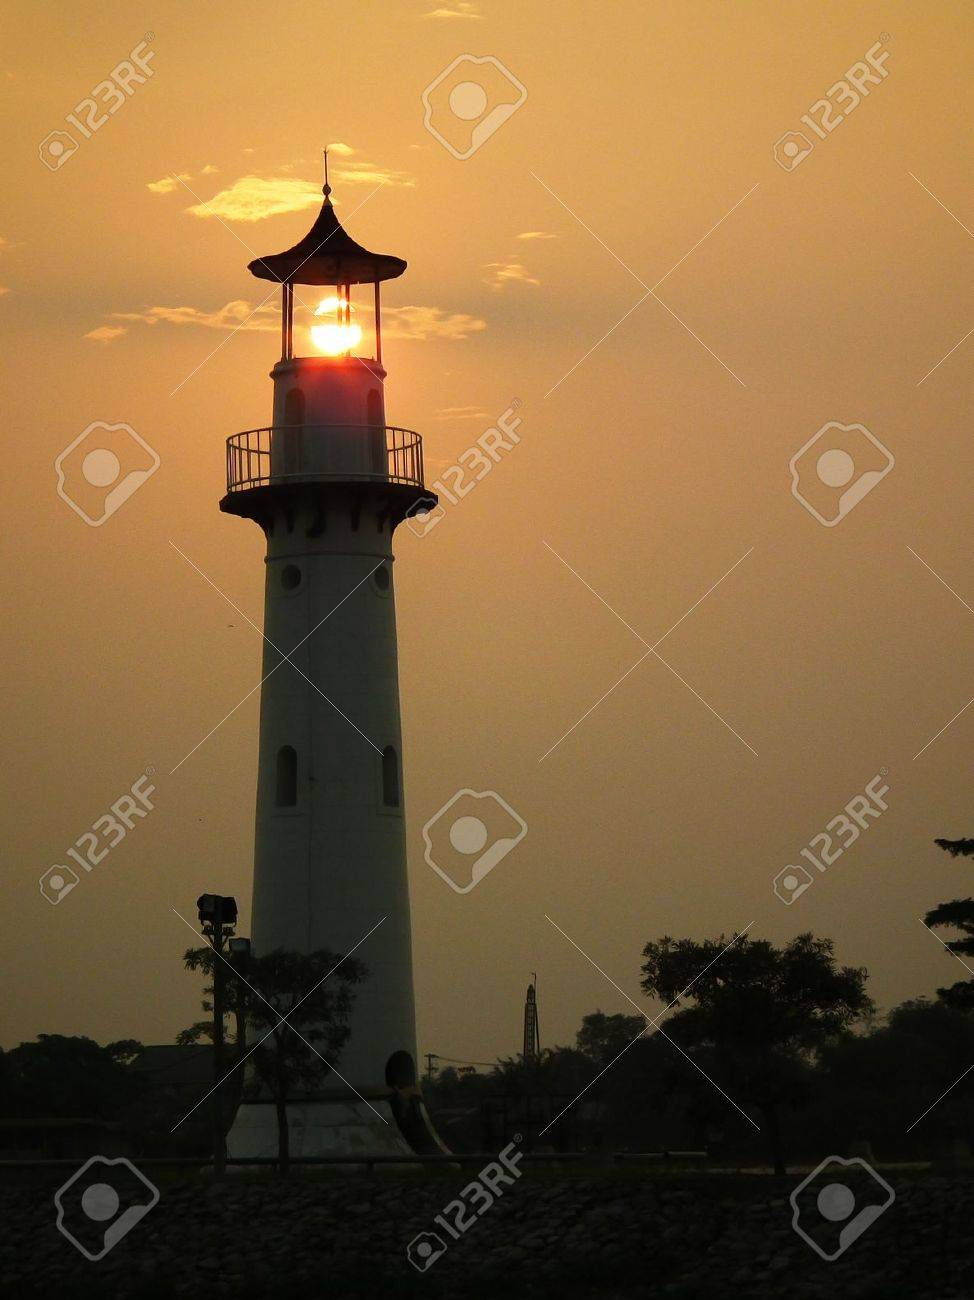 illustration of Lighthouse on sunset Stock Photo - 12719178